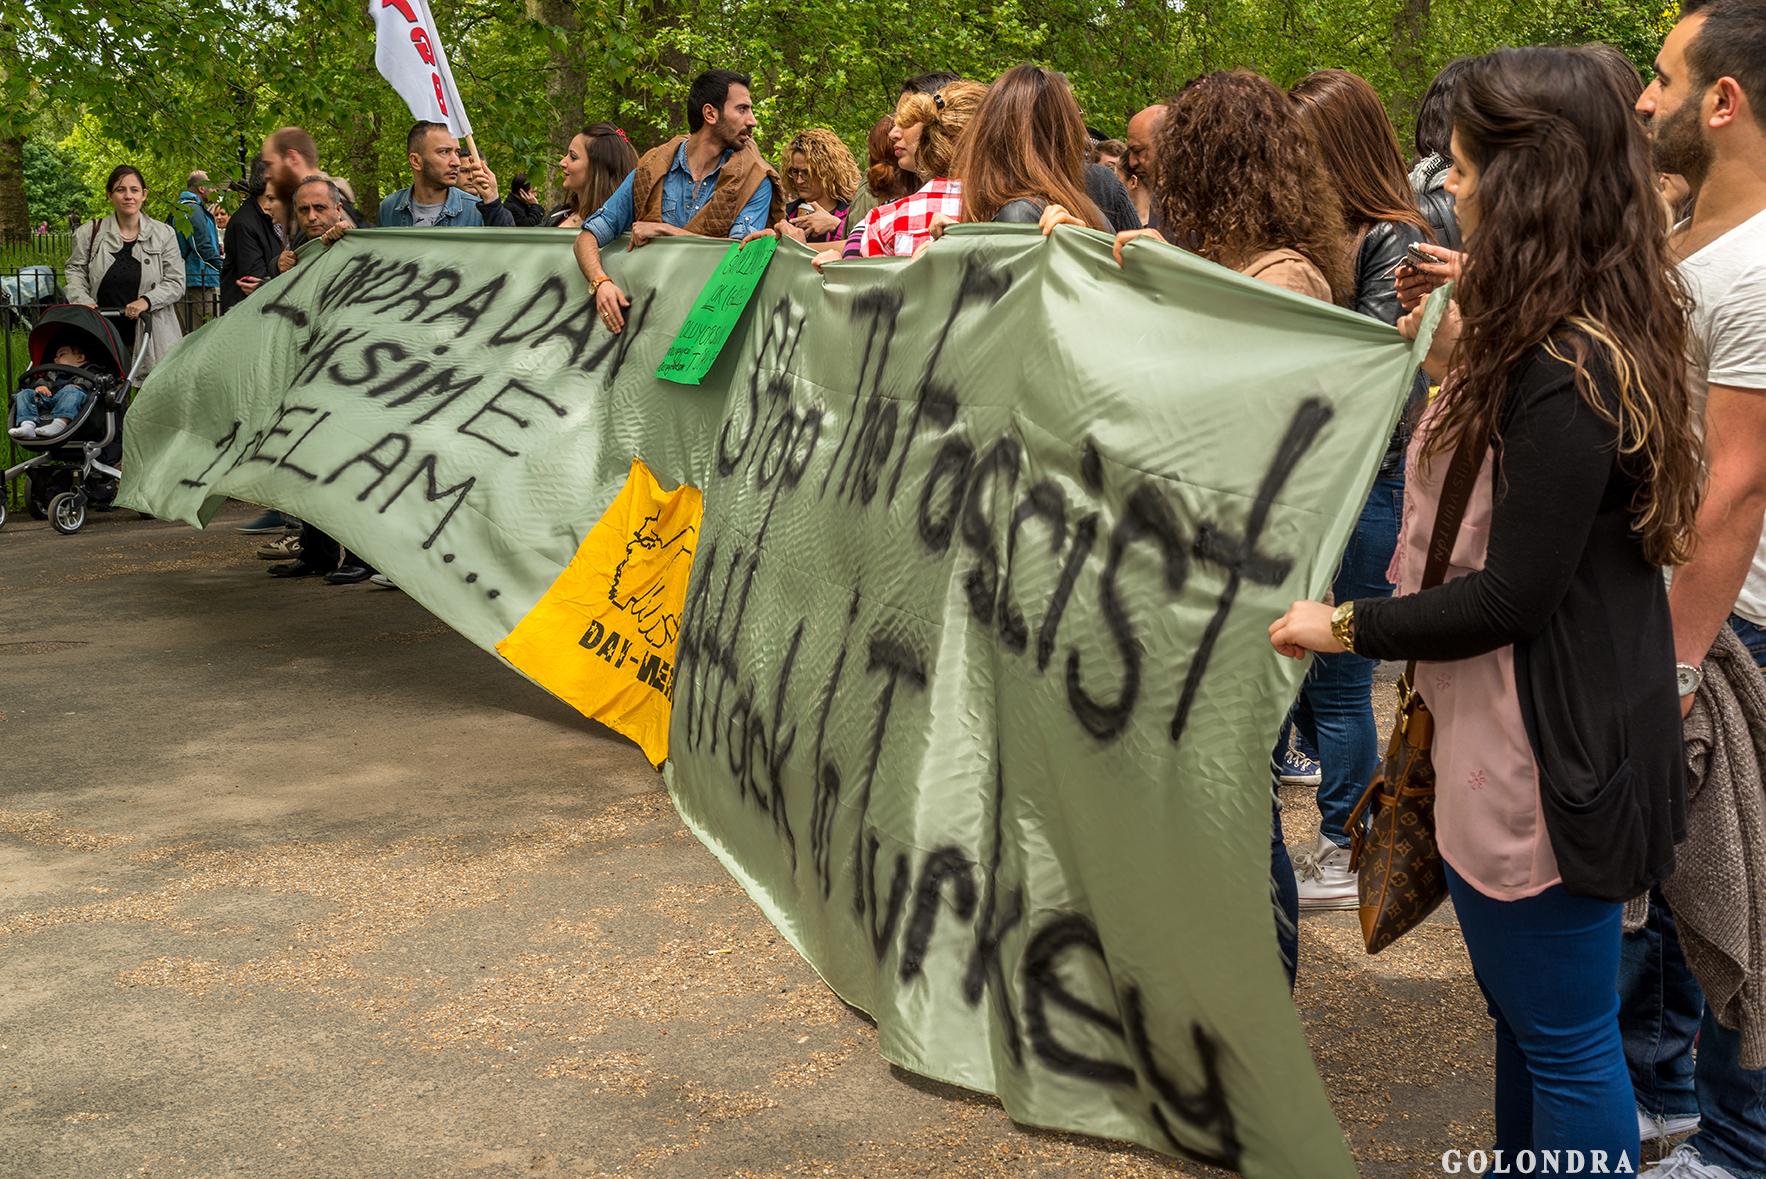 Protesting Turkish Government - Turk Hukumetini Protesto - Londra - London (16)